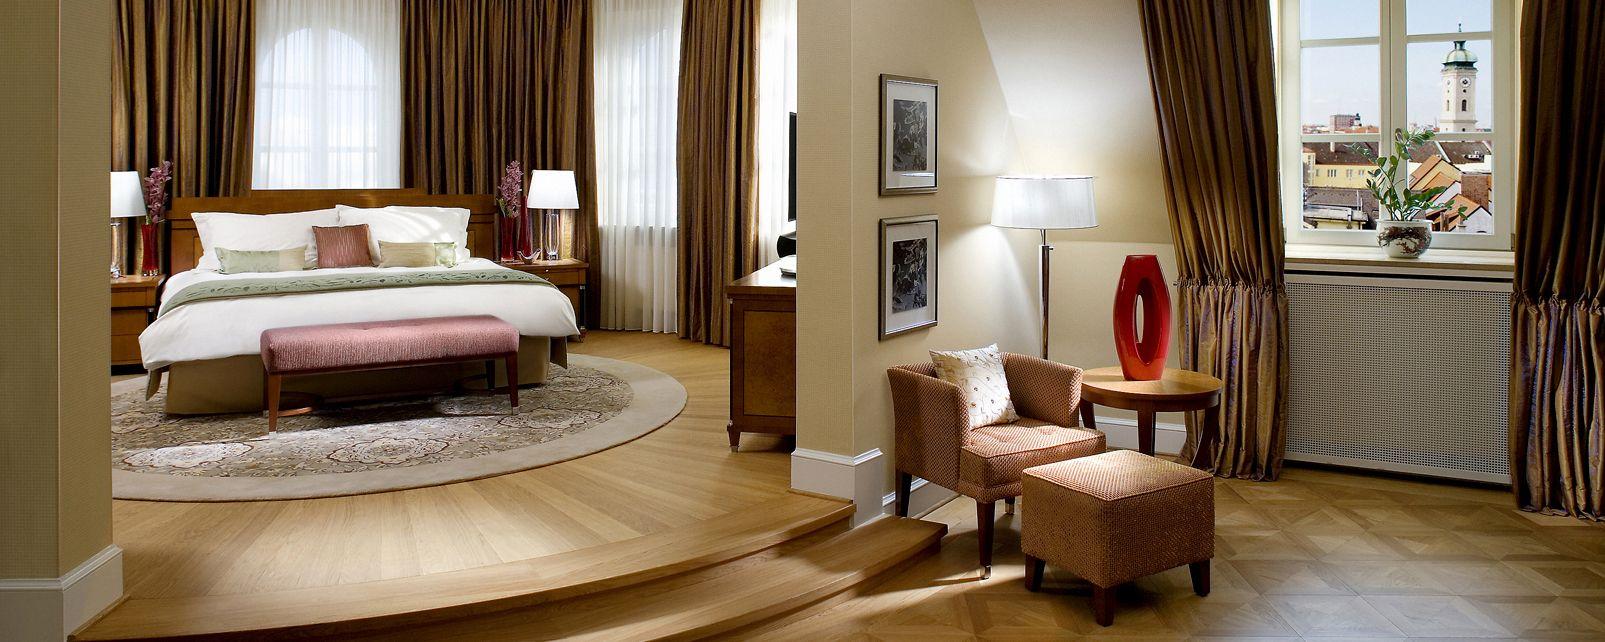 Hôtel Mandarin Oriental Munich